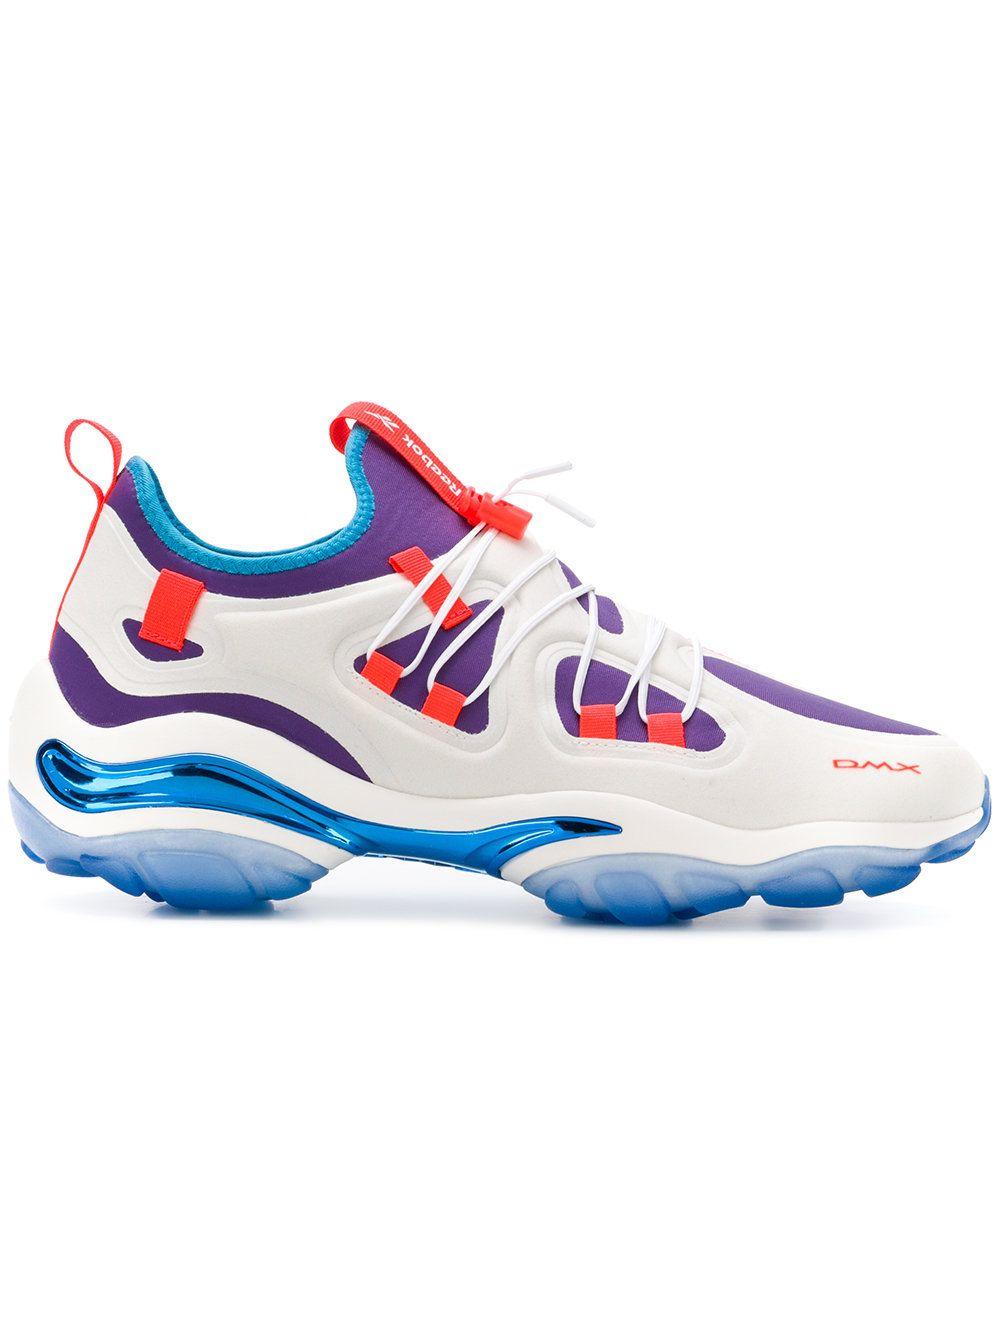 Reebok DMX series 2000 low sneakers  c5a72fe21